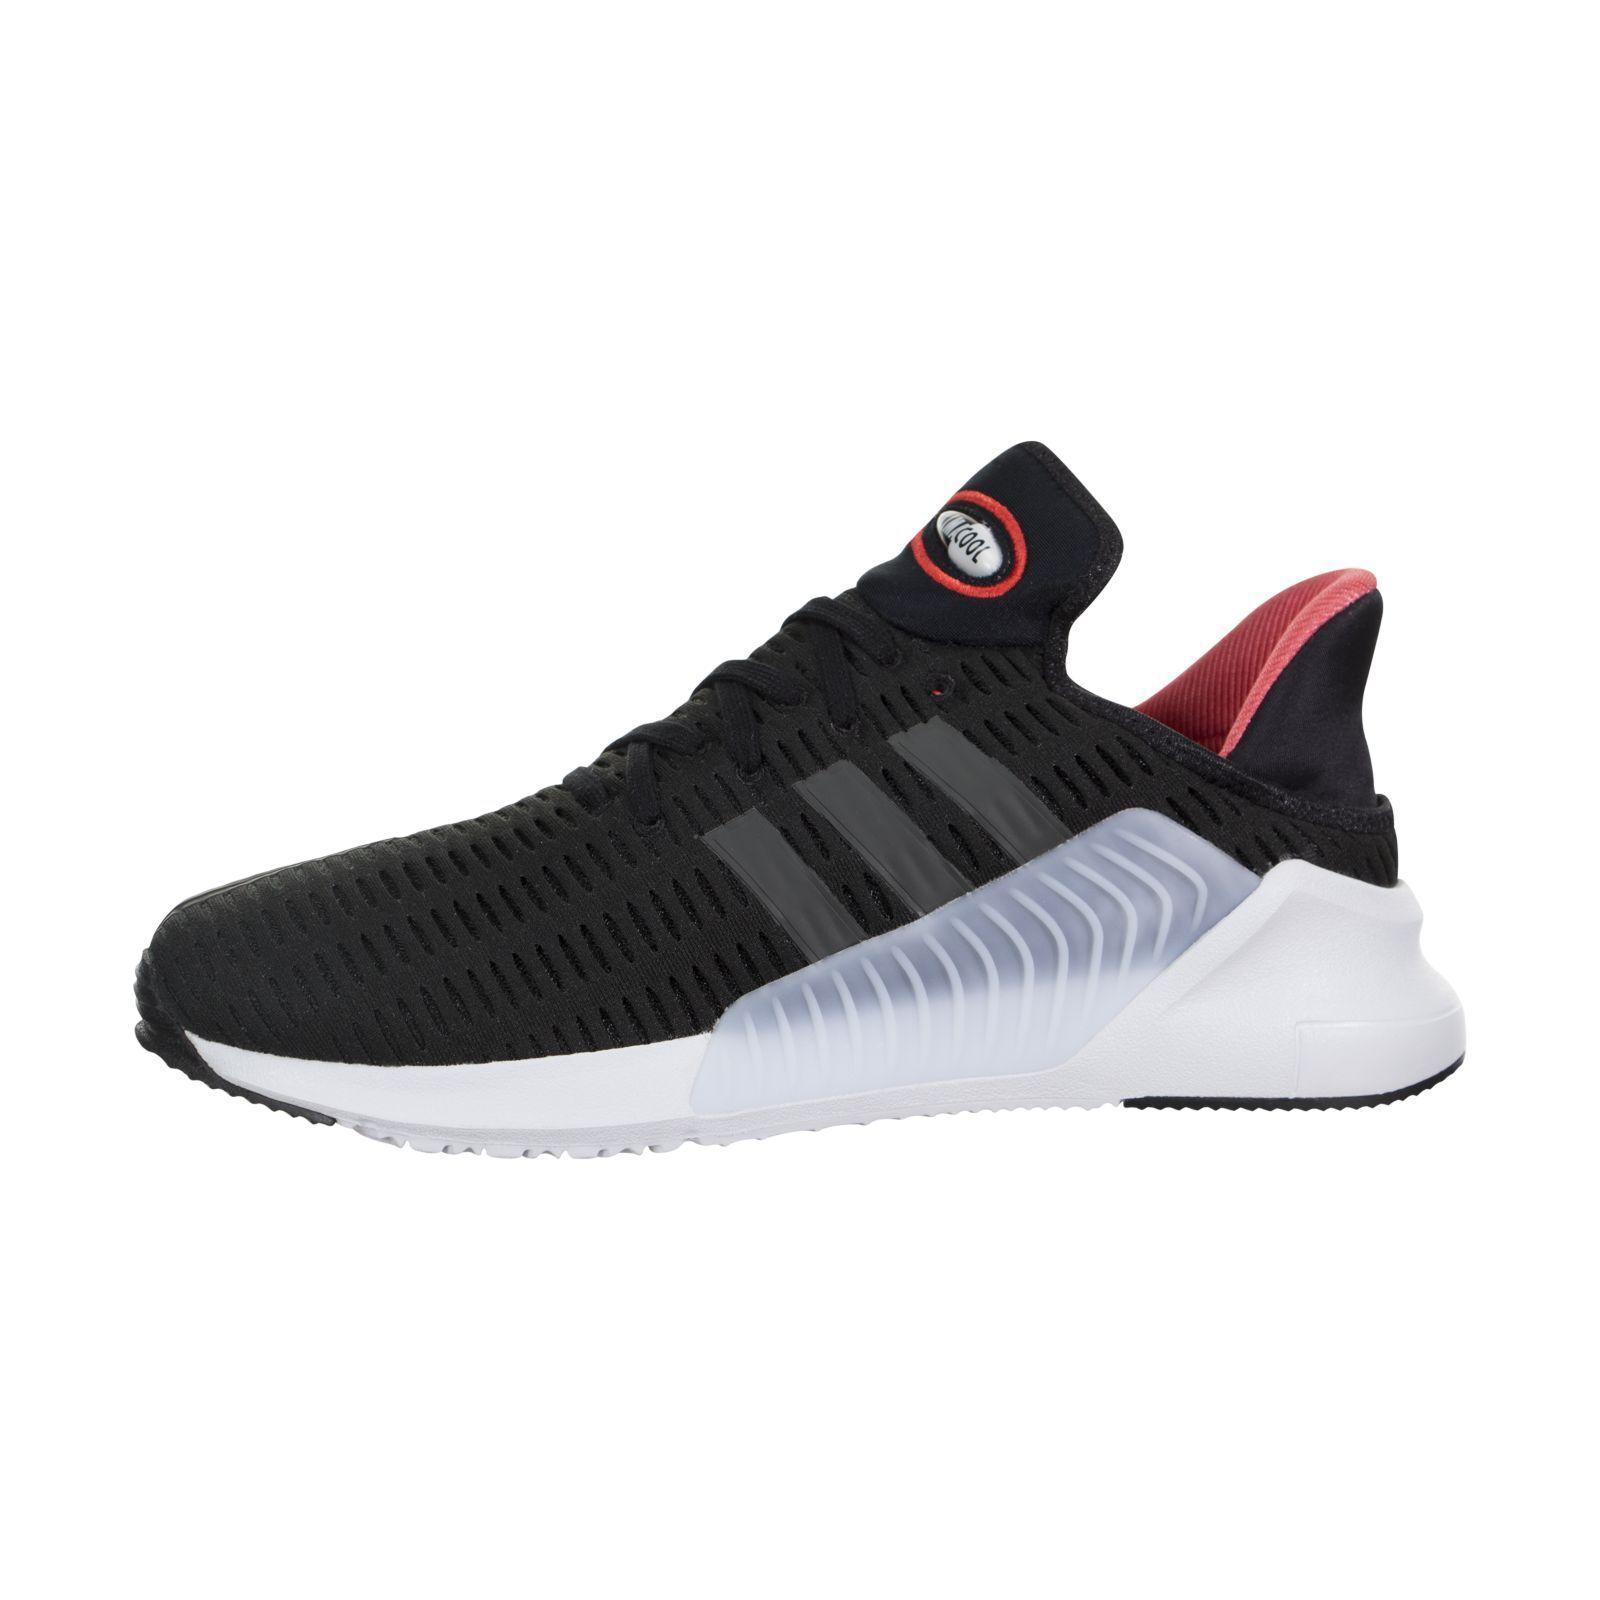 Adidas ClimaCool 02 17 cg3347